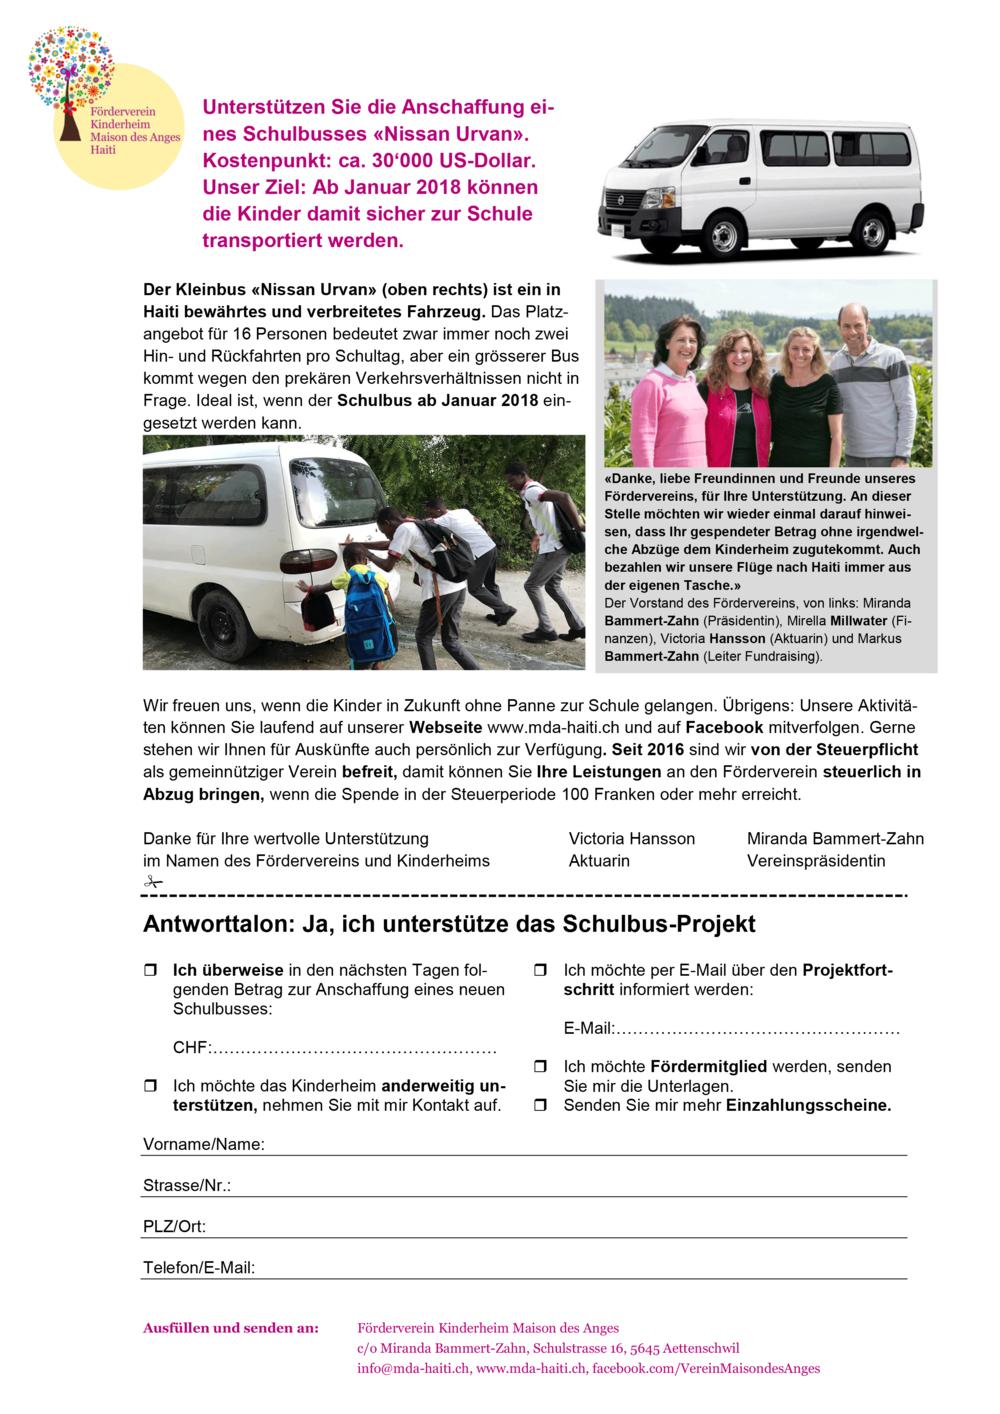 Maison-des-Anges-Mailing-Nov17-Seite2.png